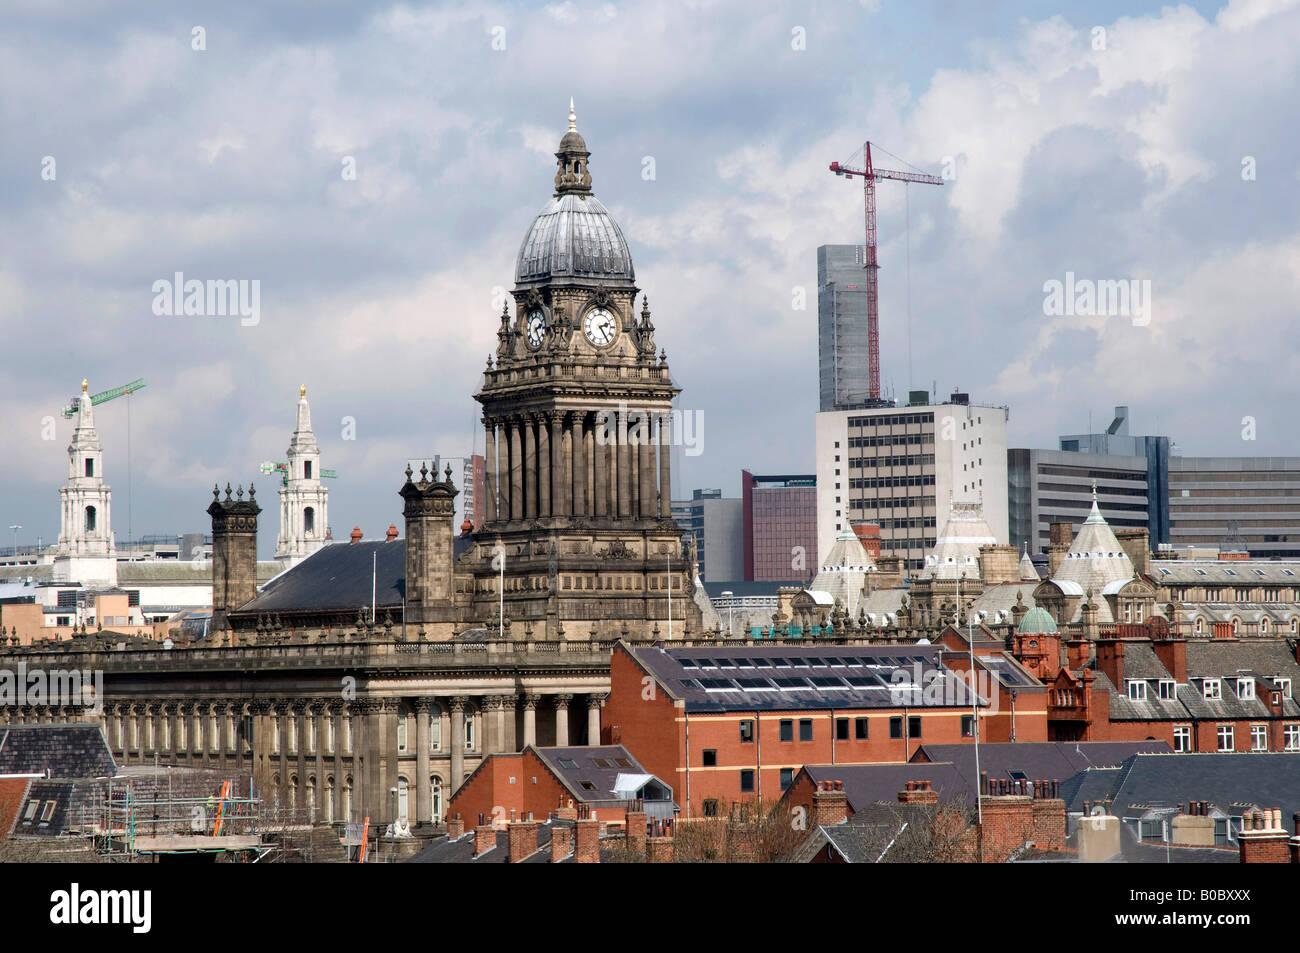 Leeds Town Hall and Financial District, Leeds, Northern England - Stock Image